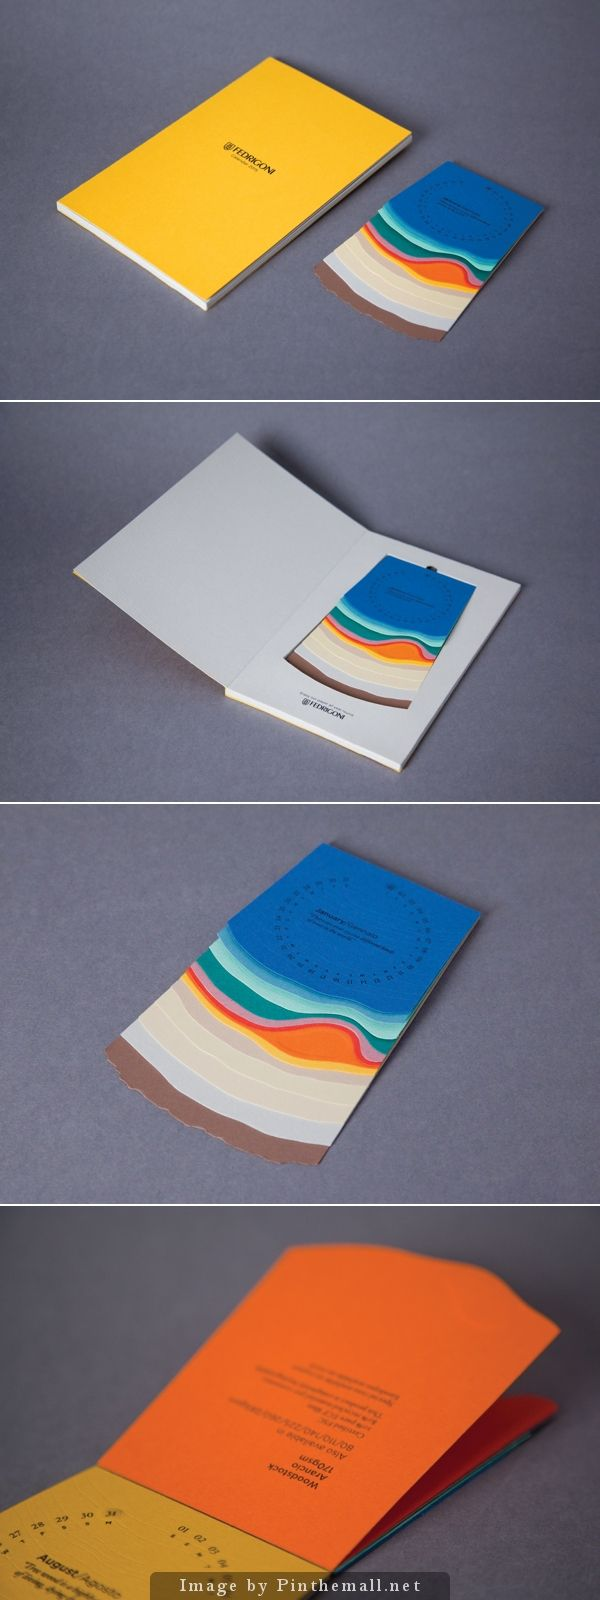 Fedrigoni Desk Calendar 2015 by Christopher Hoare